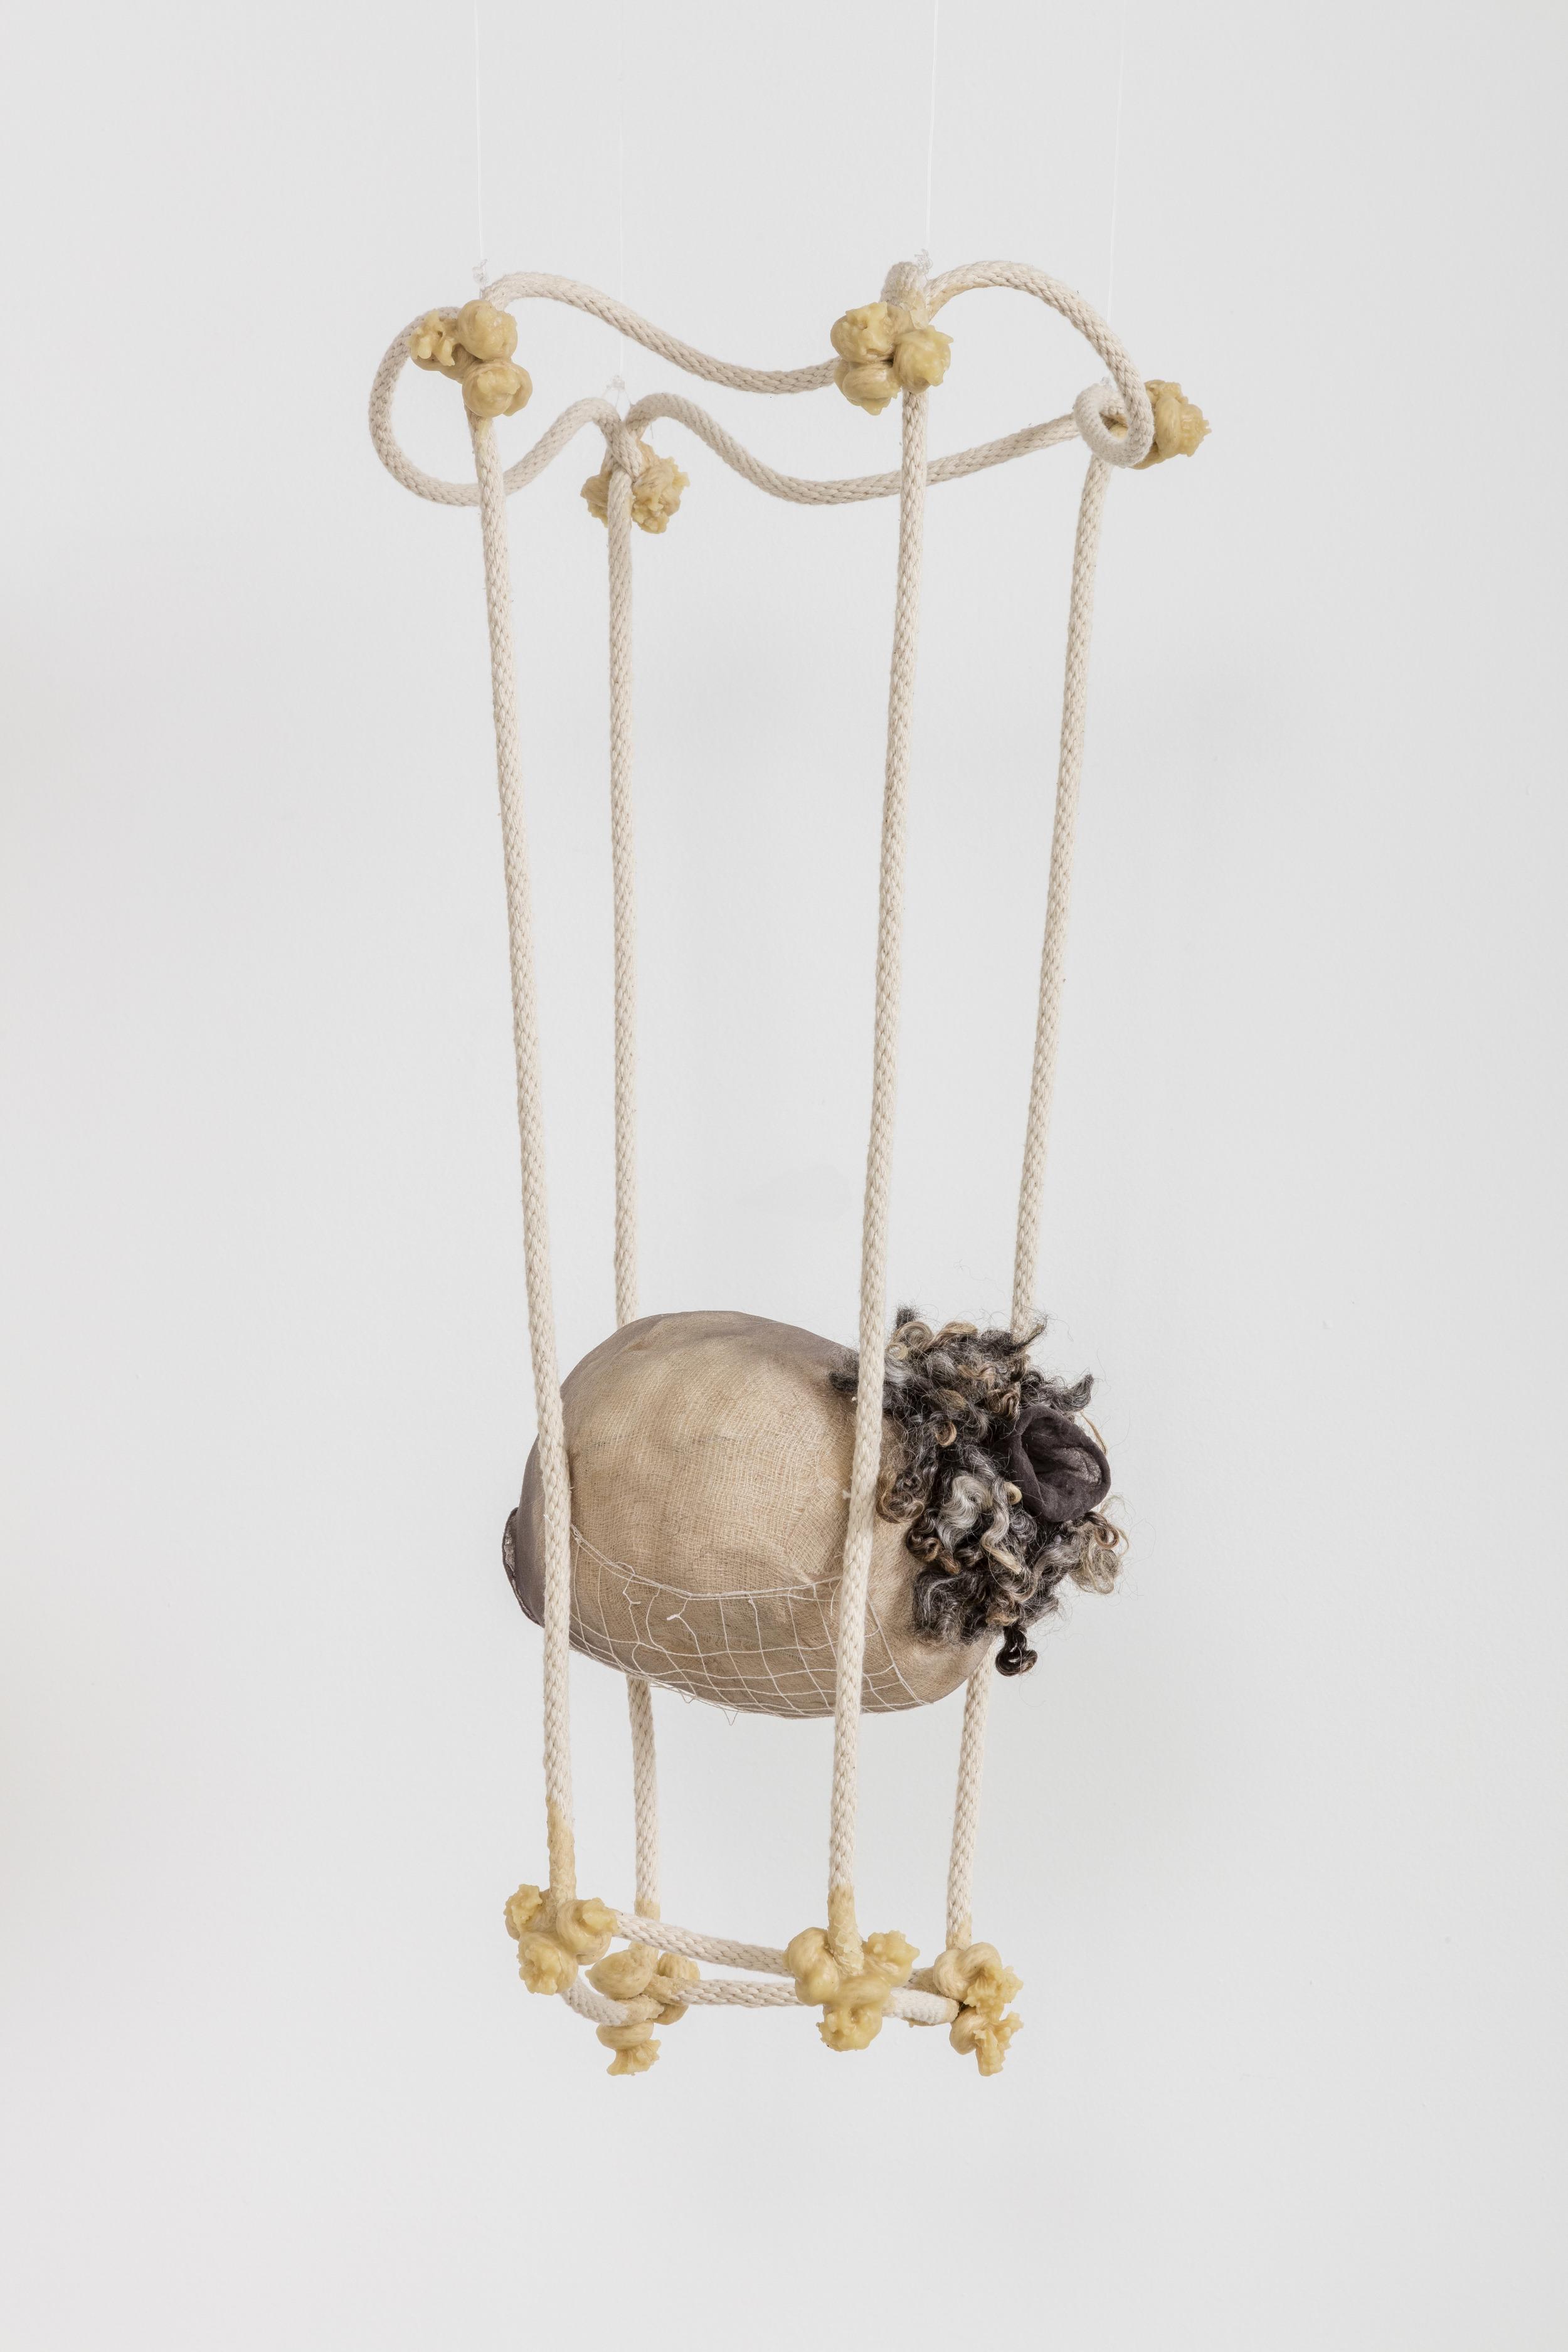 Tanya Aguiniga   Omission , 2016  Cotton rope, cotton thread, foam, gauze,nylon, wool, nylon and beeswax  24 x 10.5 x 8 inches